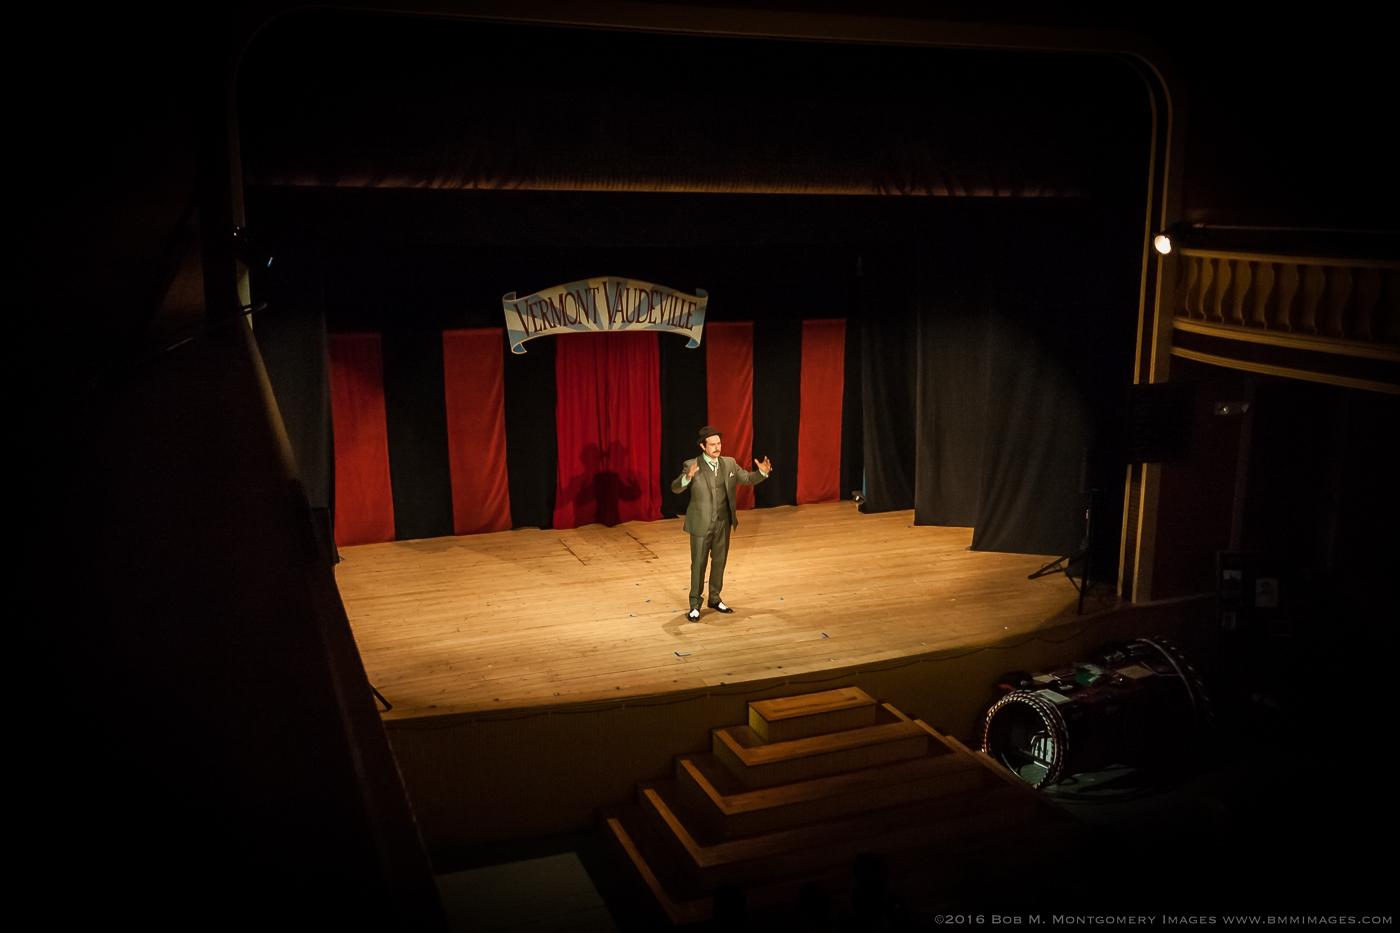 Vermont Vaudeville 20160513 - 0038.jpg